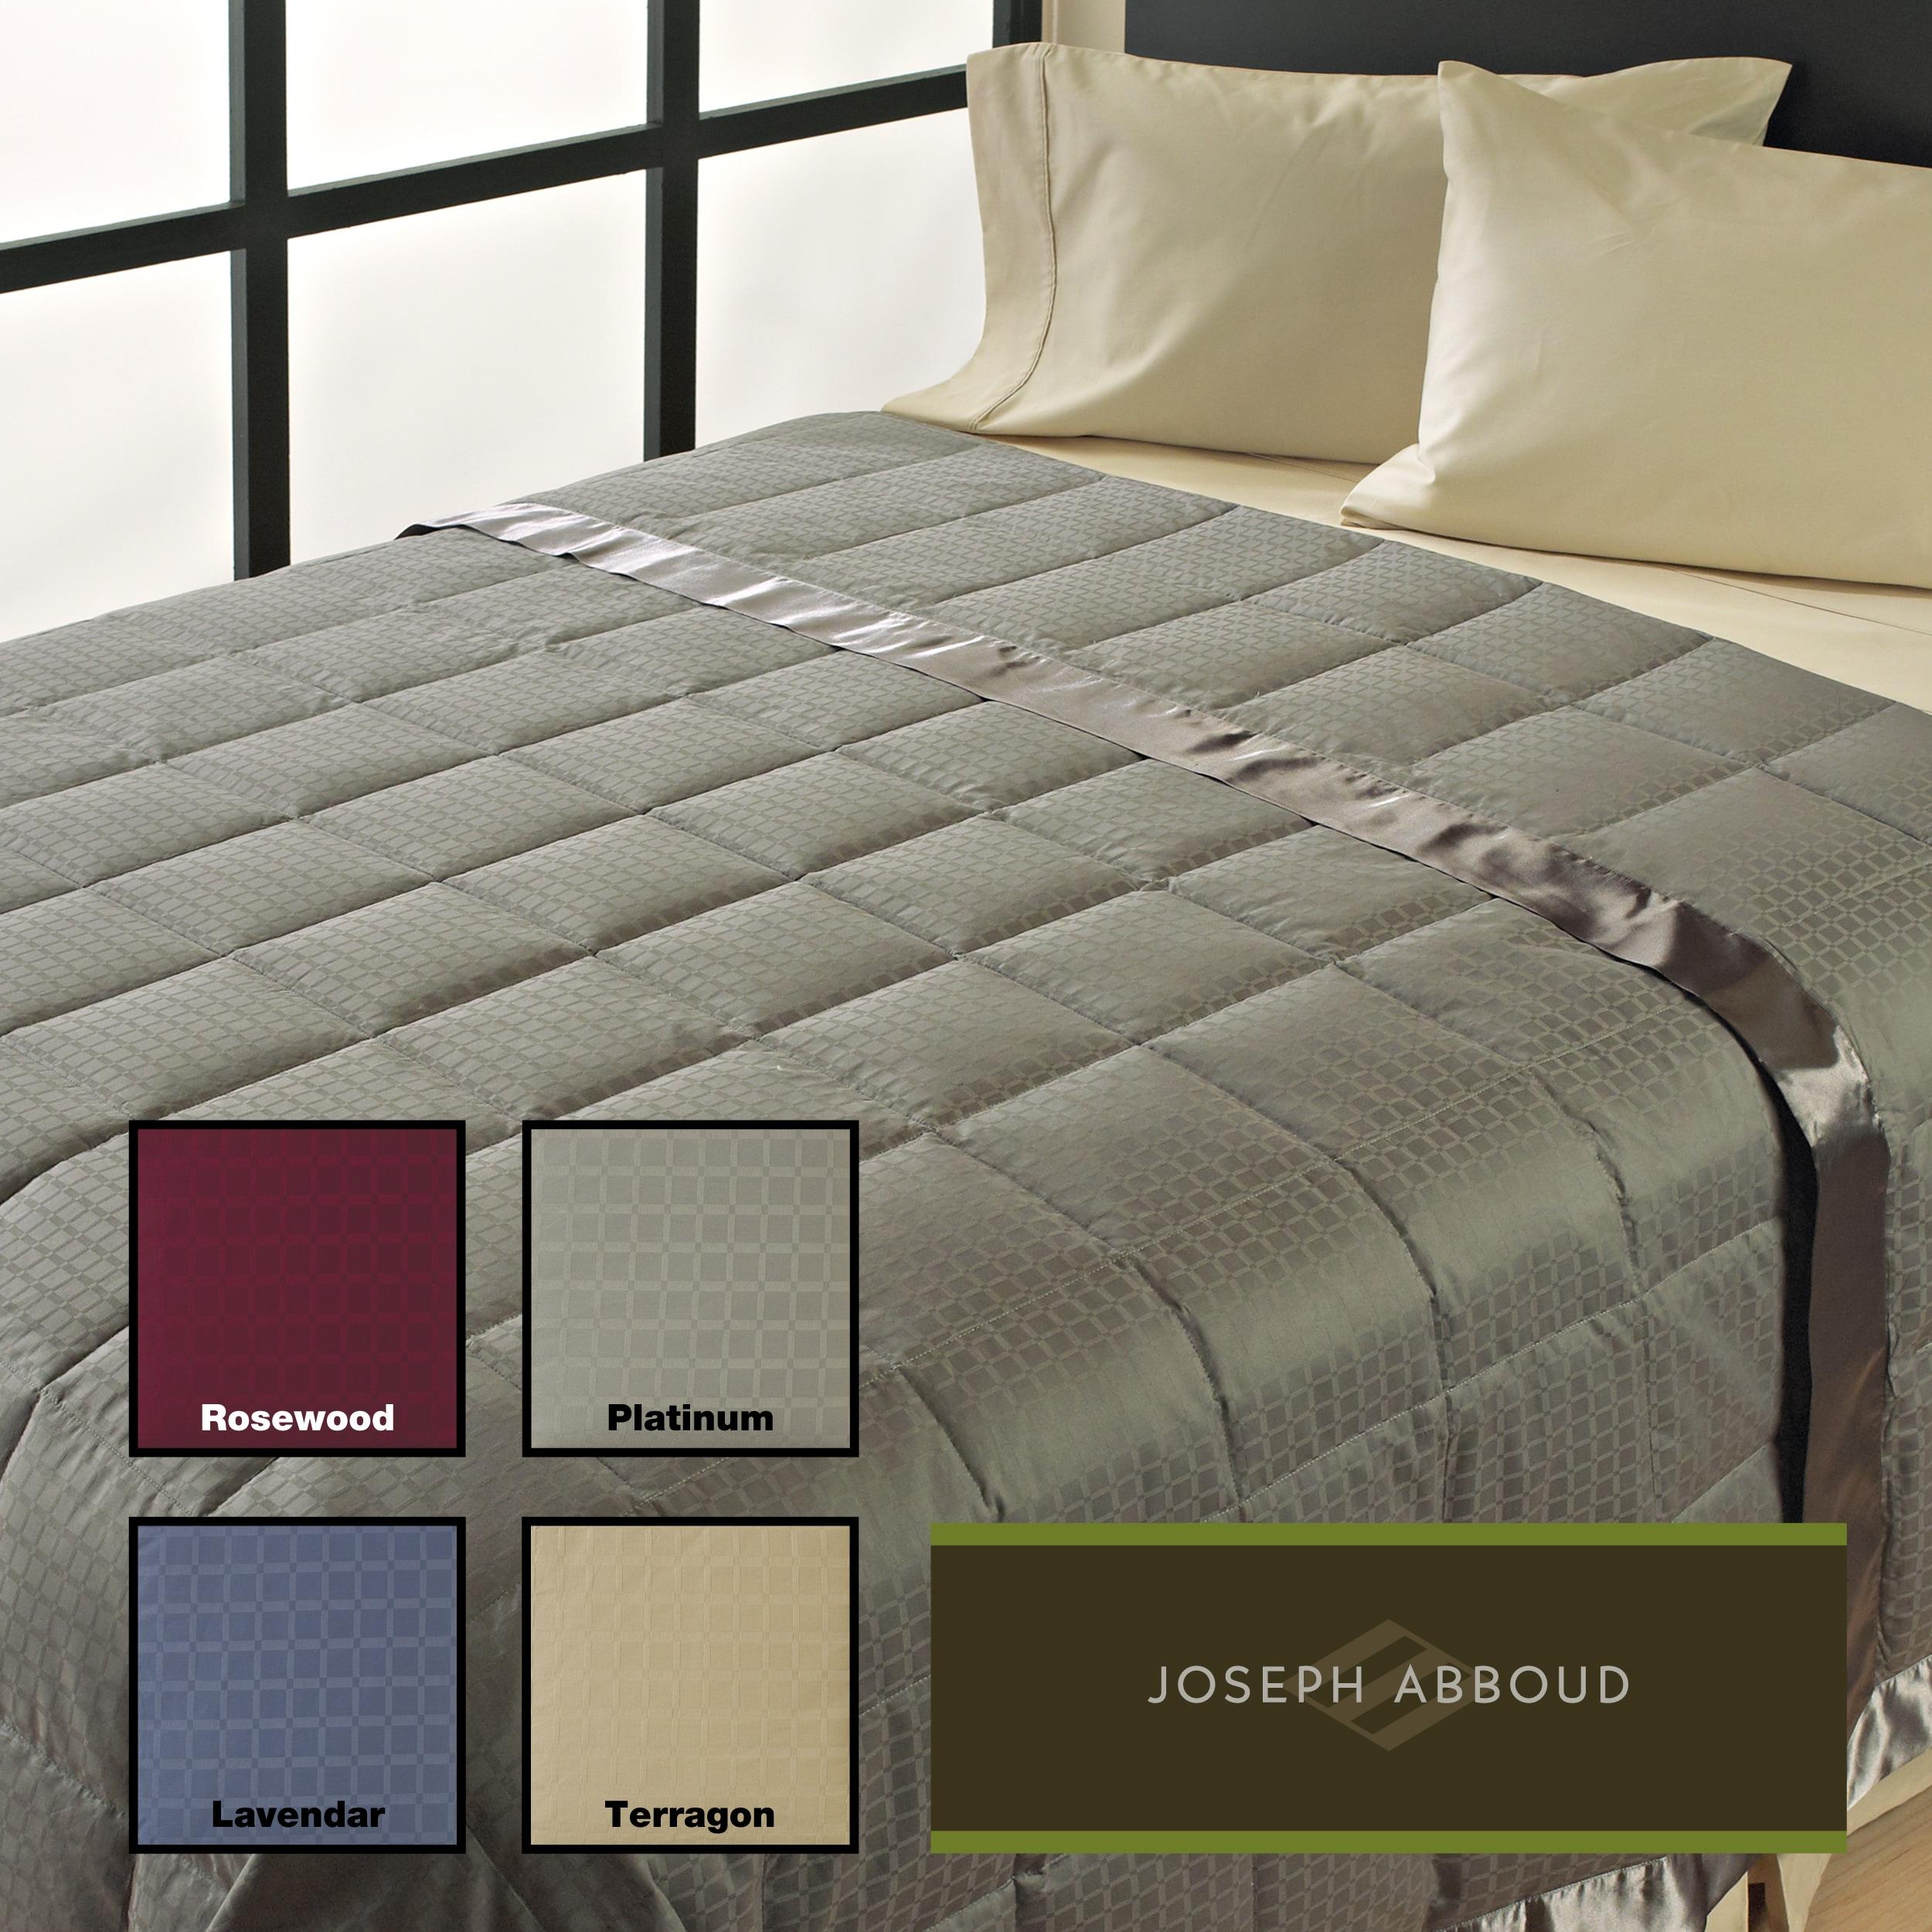 Joseph Abboud Classic 305 Thread Count Down Blanket